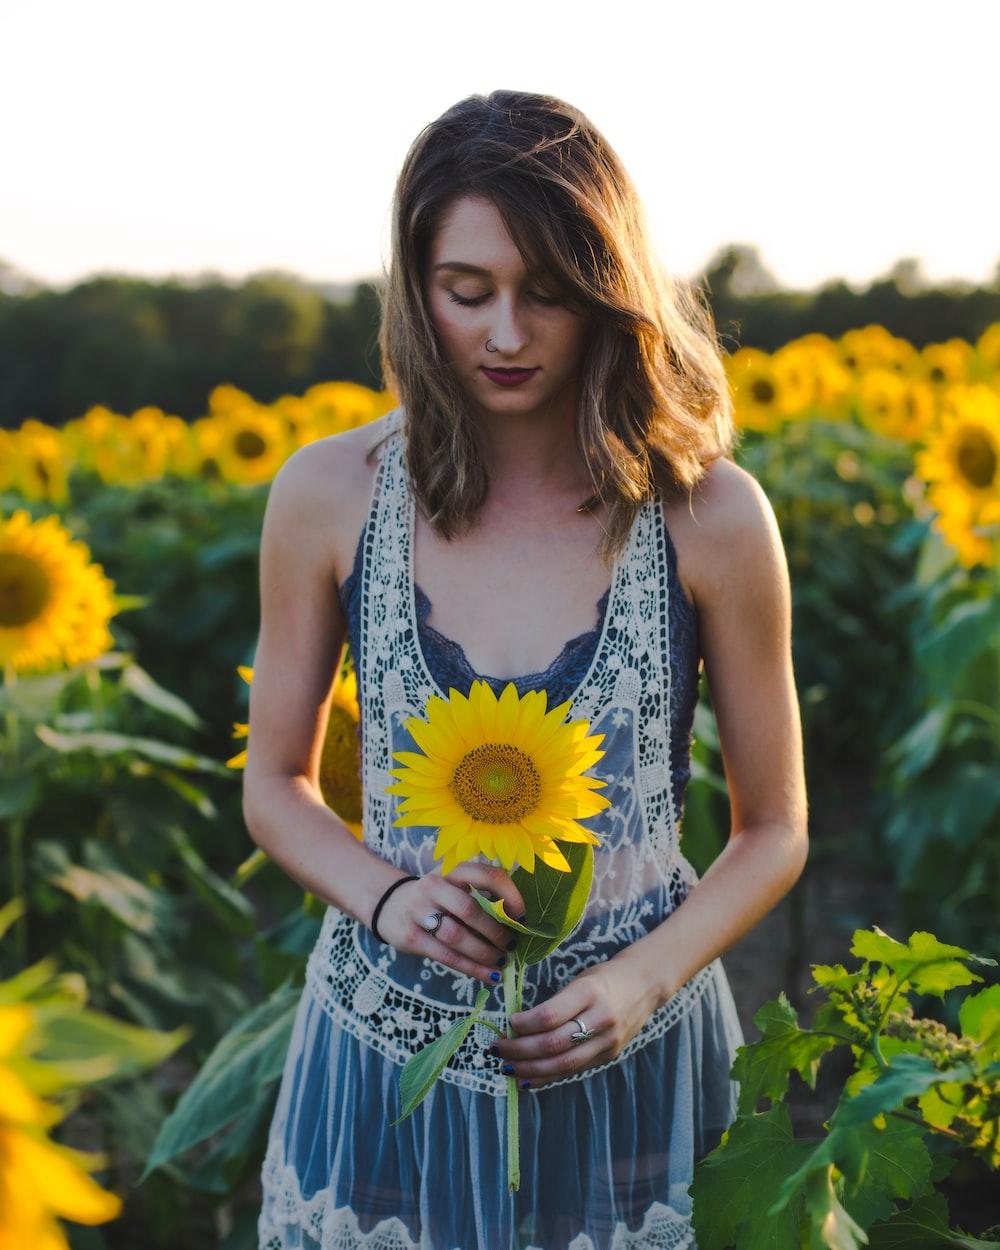 woman standing at sunflower field